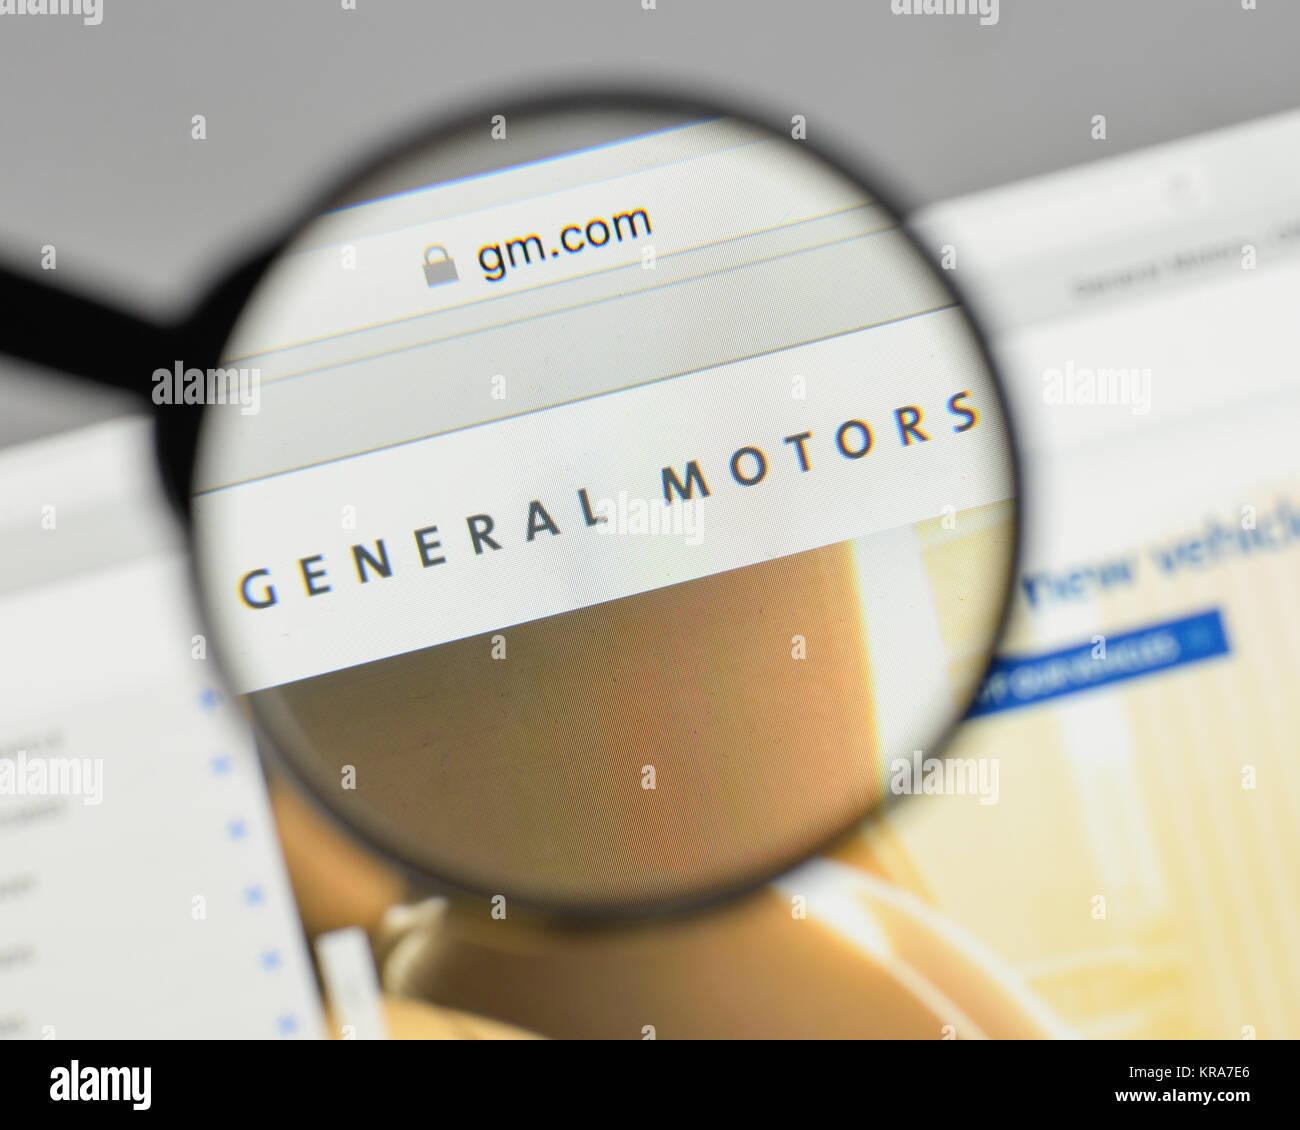 Milan, Italy - August 10, 2017: General Motors logo on the website homepage. - Stock Image